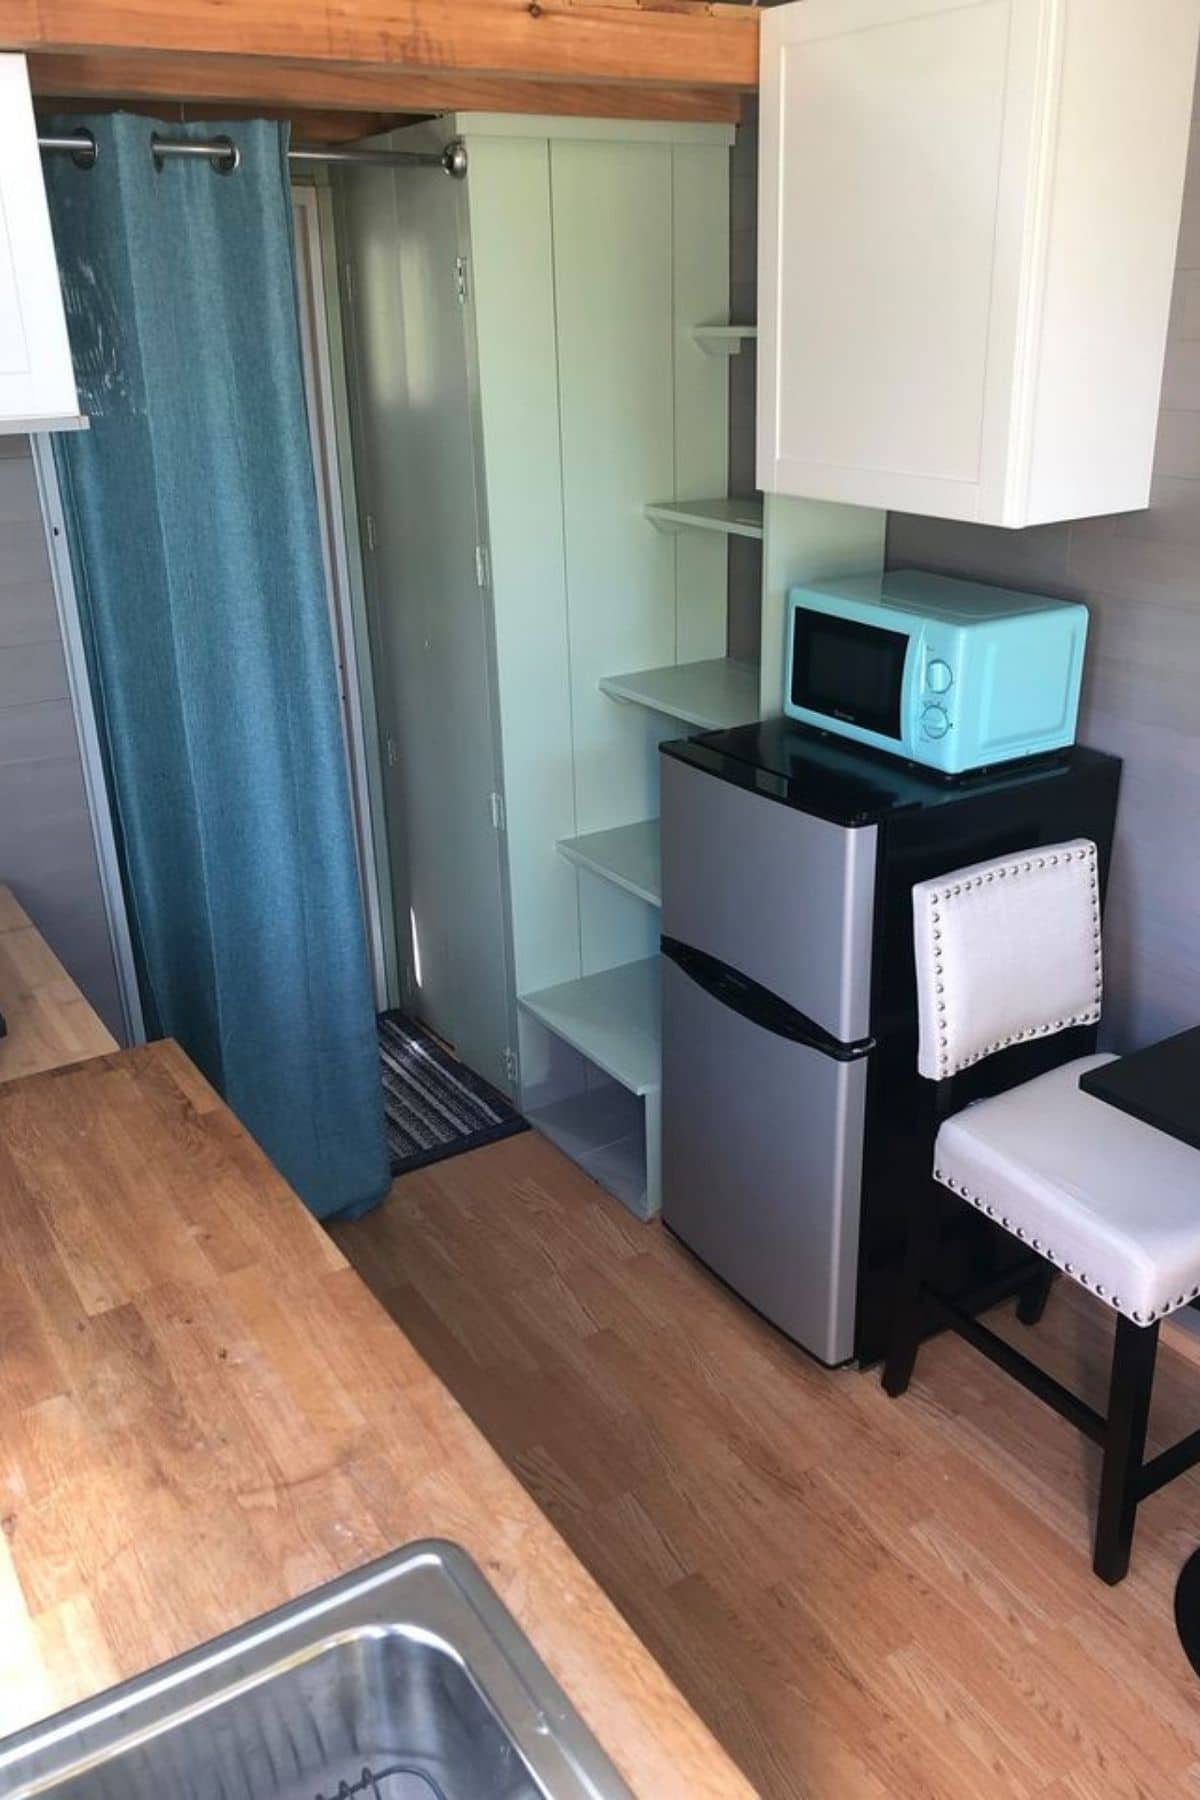 Mini refrigerator next to light green stairs and closet